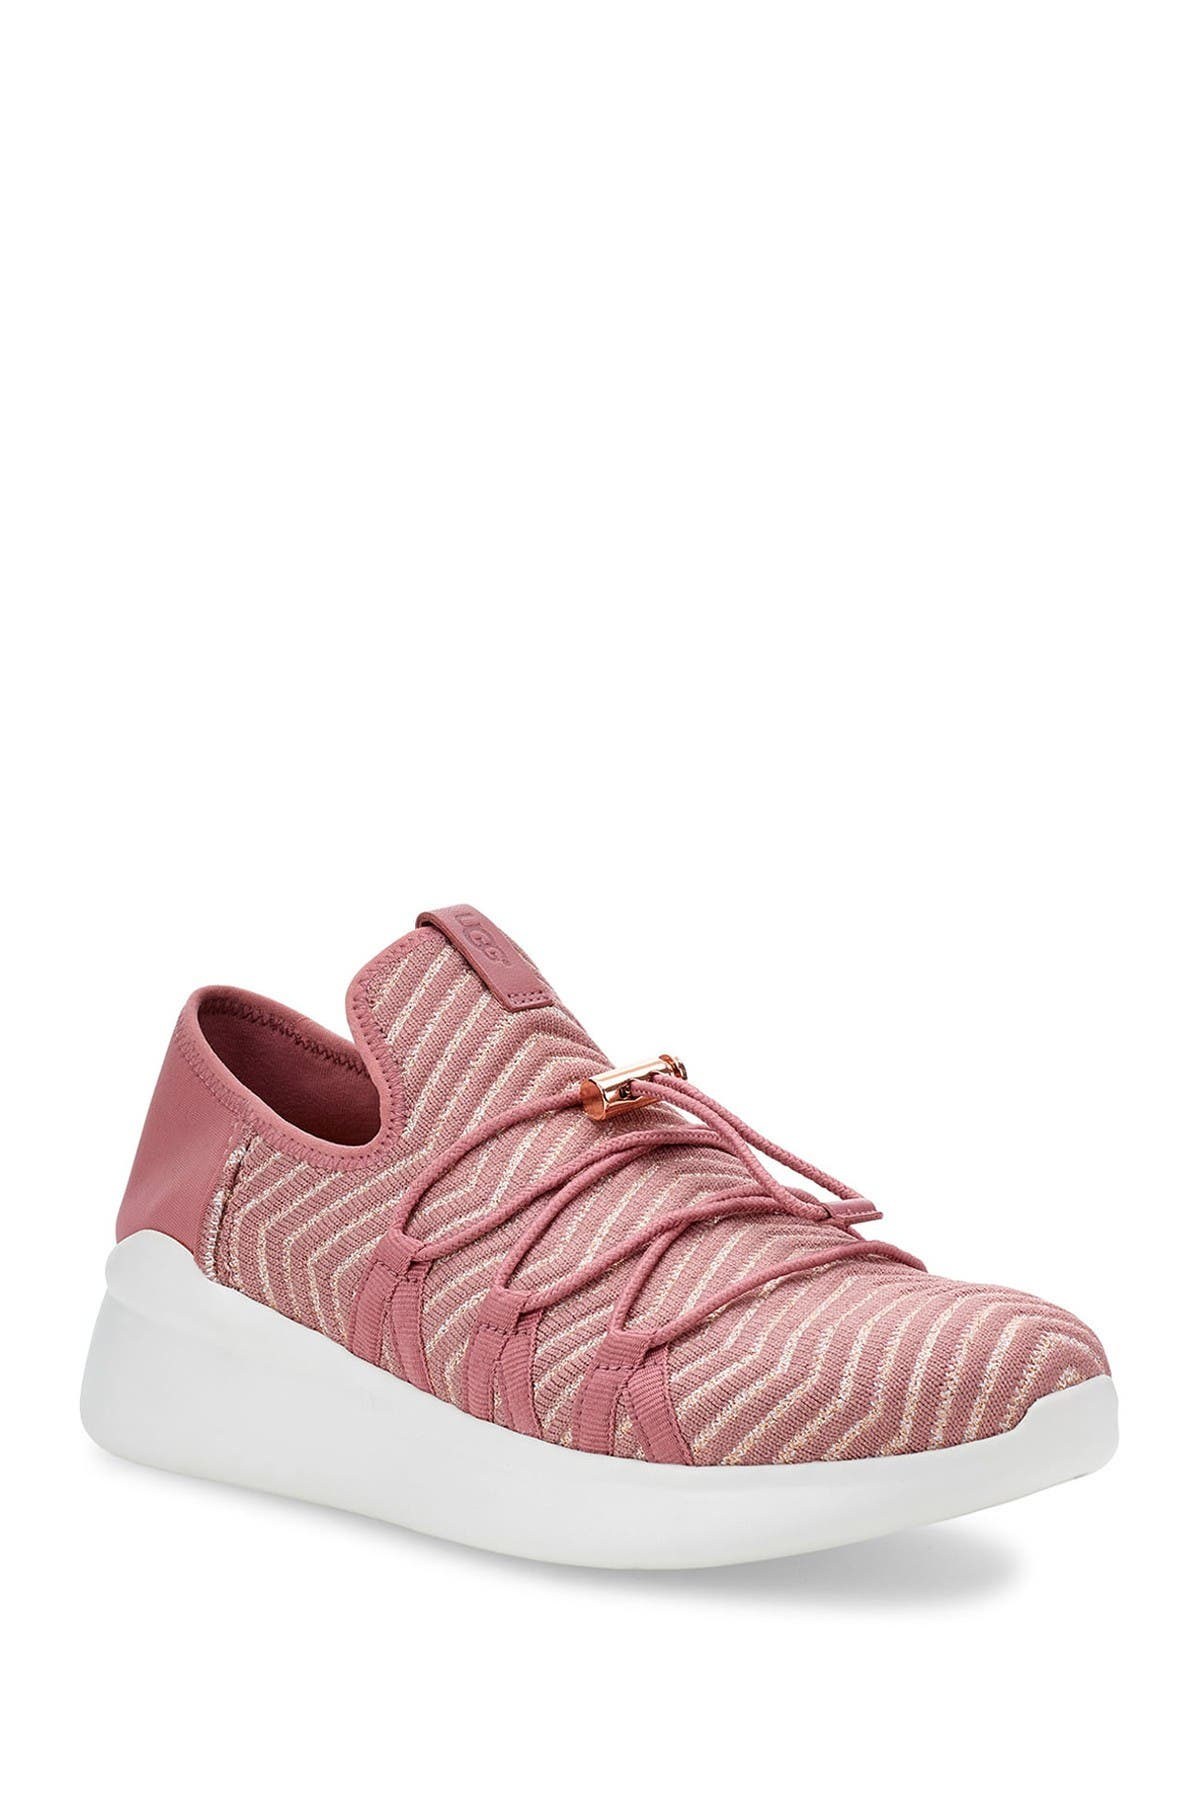 UGG | Kinney Metallic Platform Sneaker